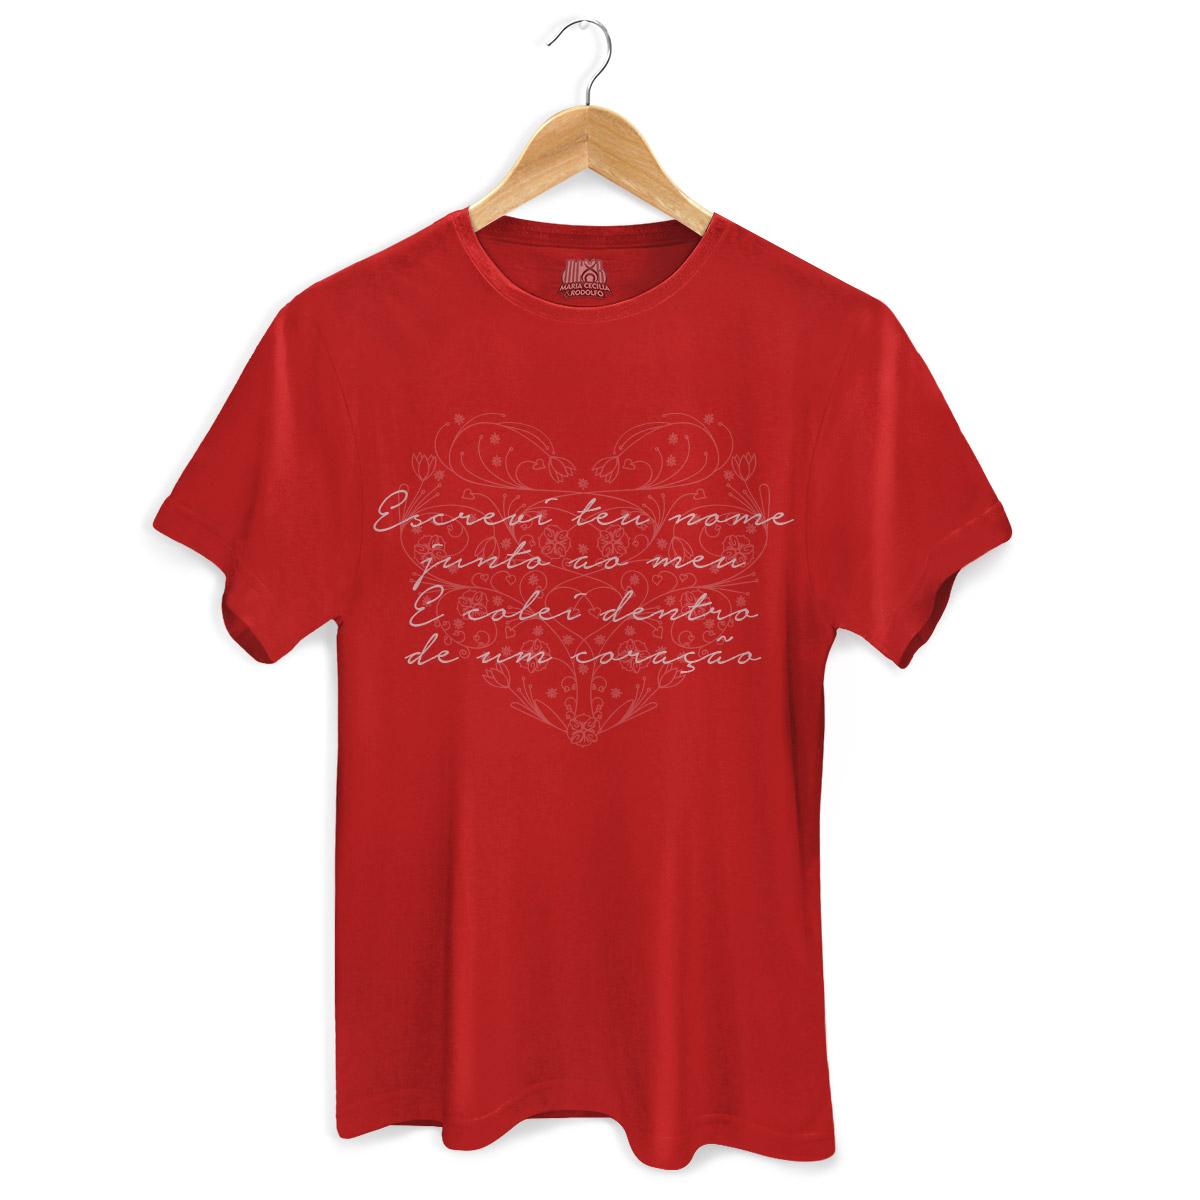 Camiseta Masculina Maria Cecília & Rodolfo Escrevi Teu Nome Red